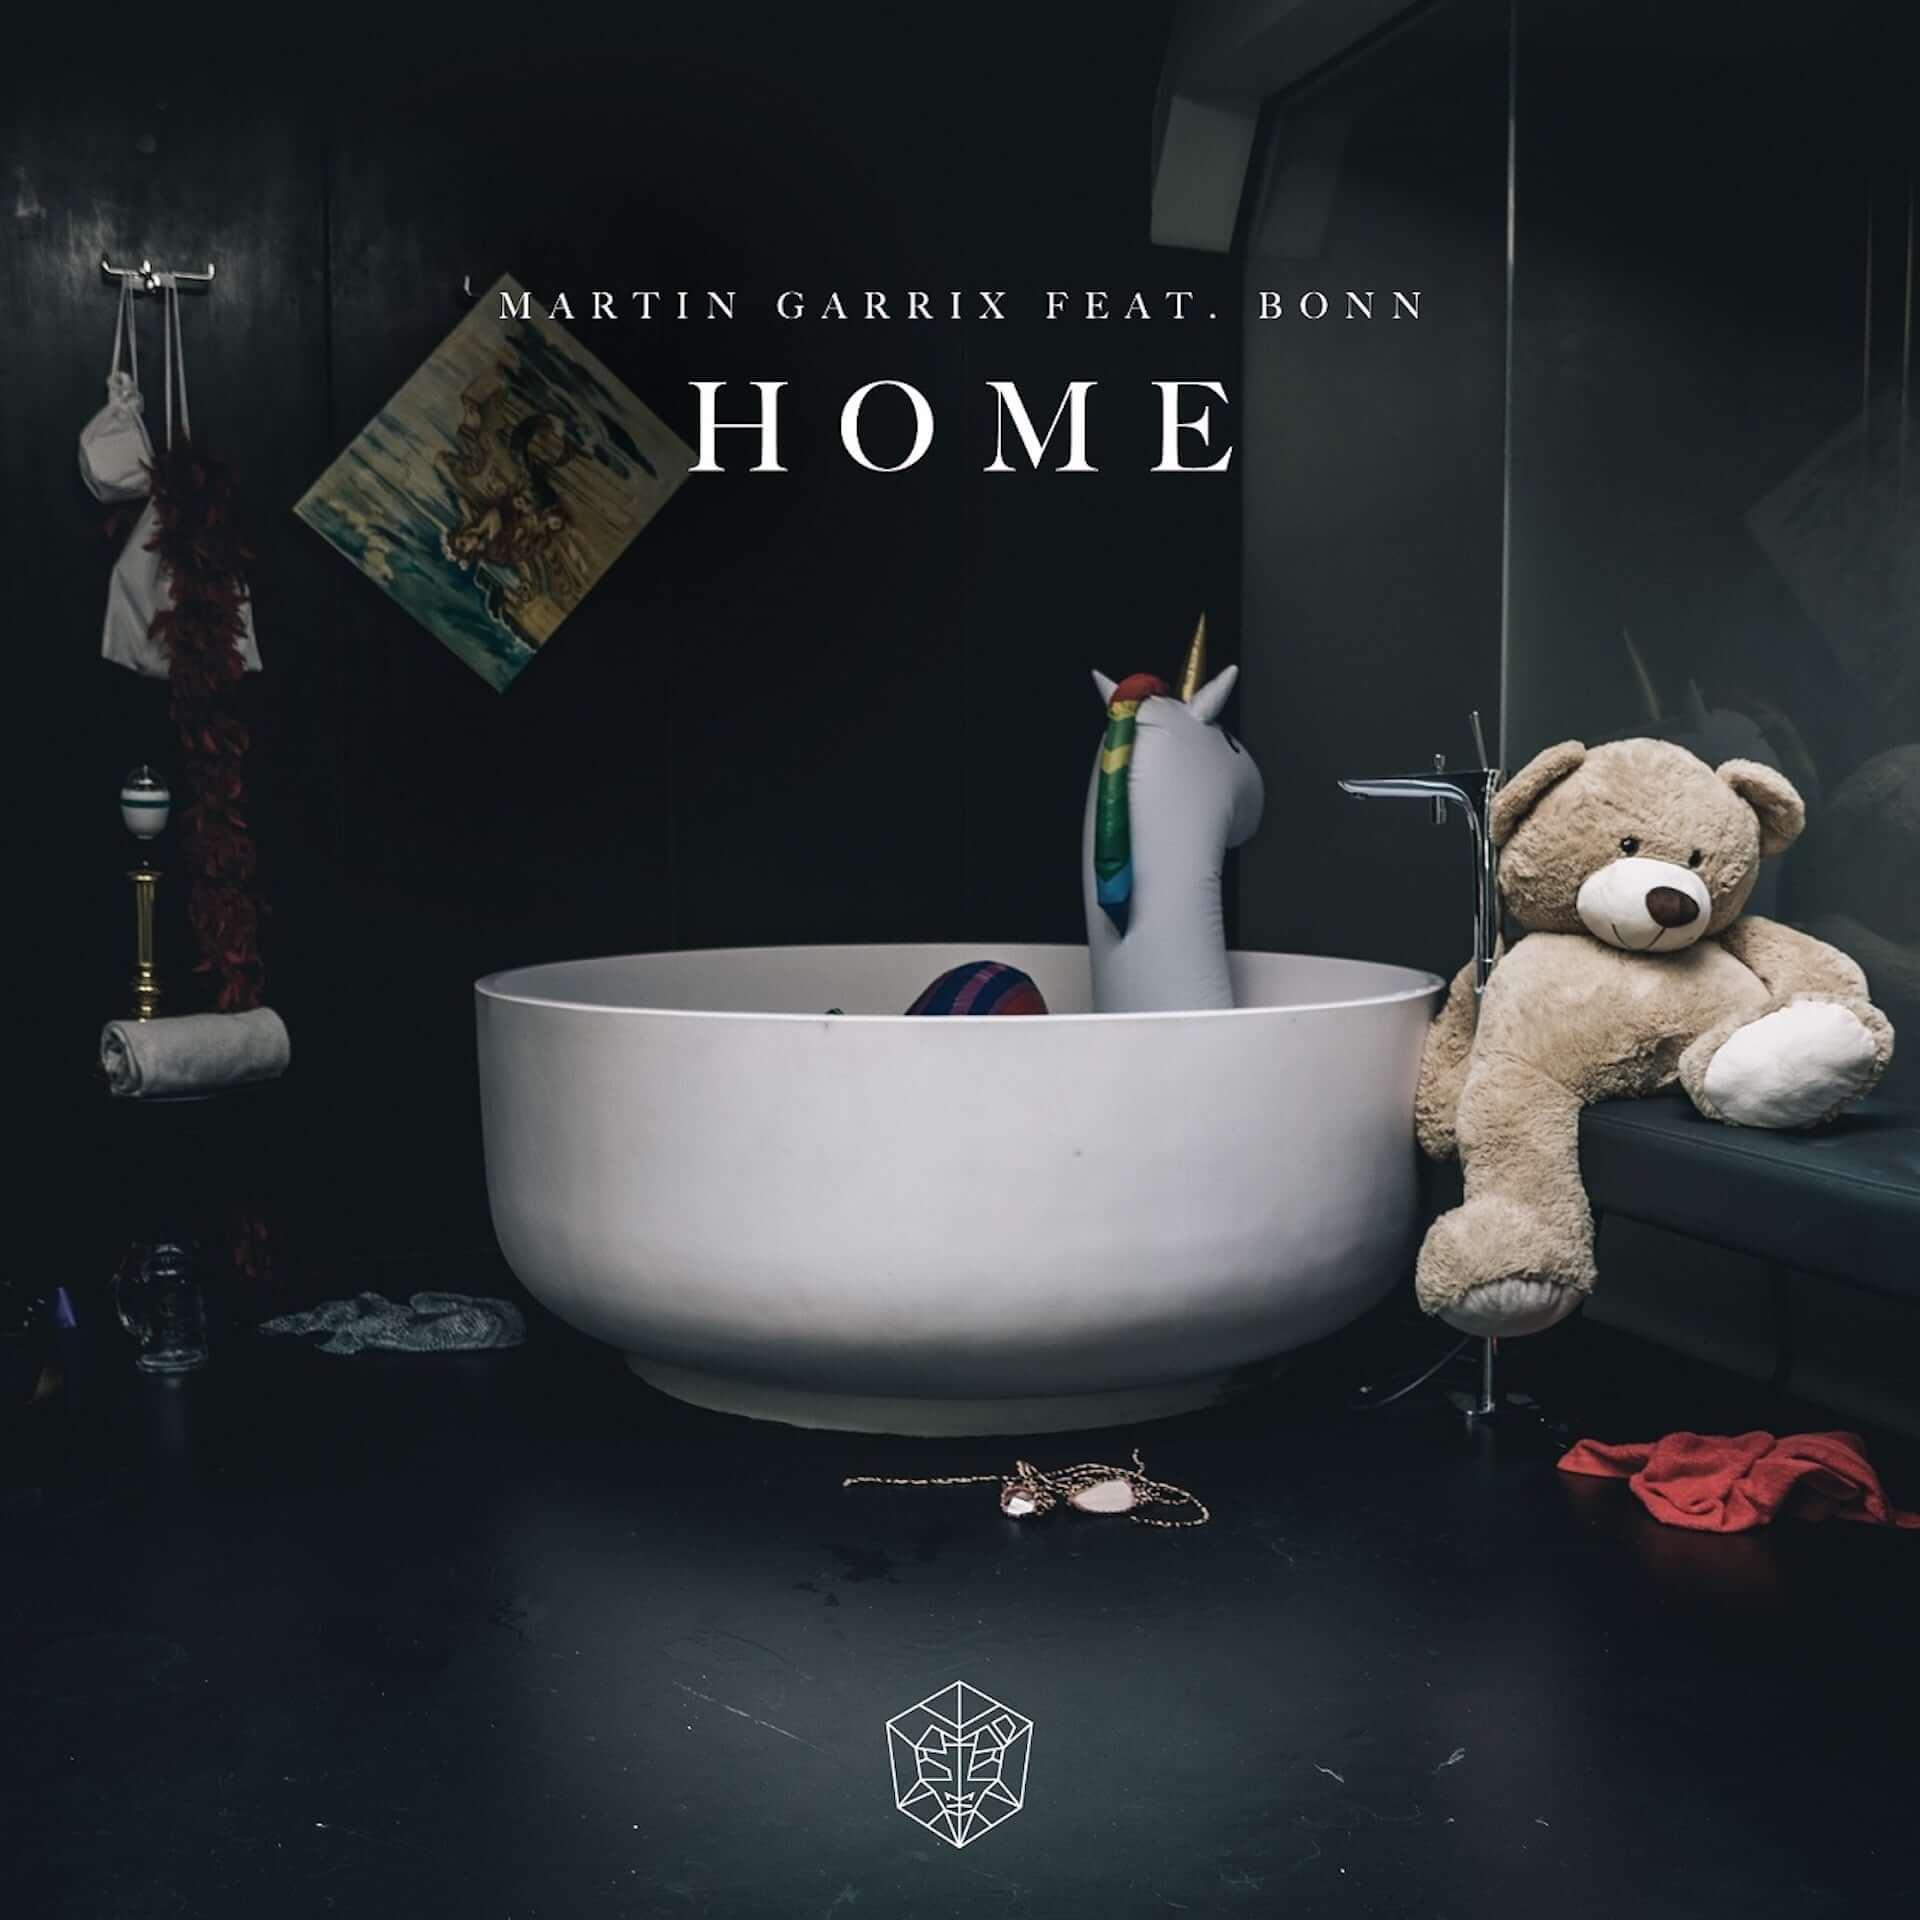 Martin Garrix、<FUJI ROCK FESTIVAL '19>でも披露した未発表曲「Home feat. Bonn」を本日リリース music190816martingarrix_2-1920x1920